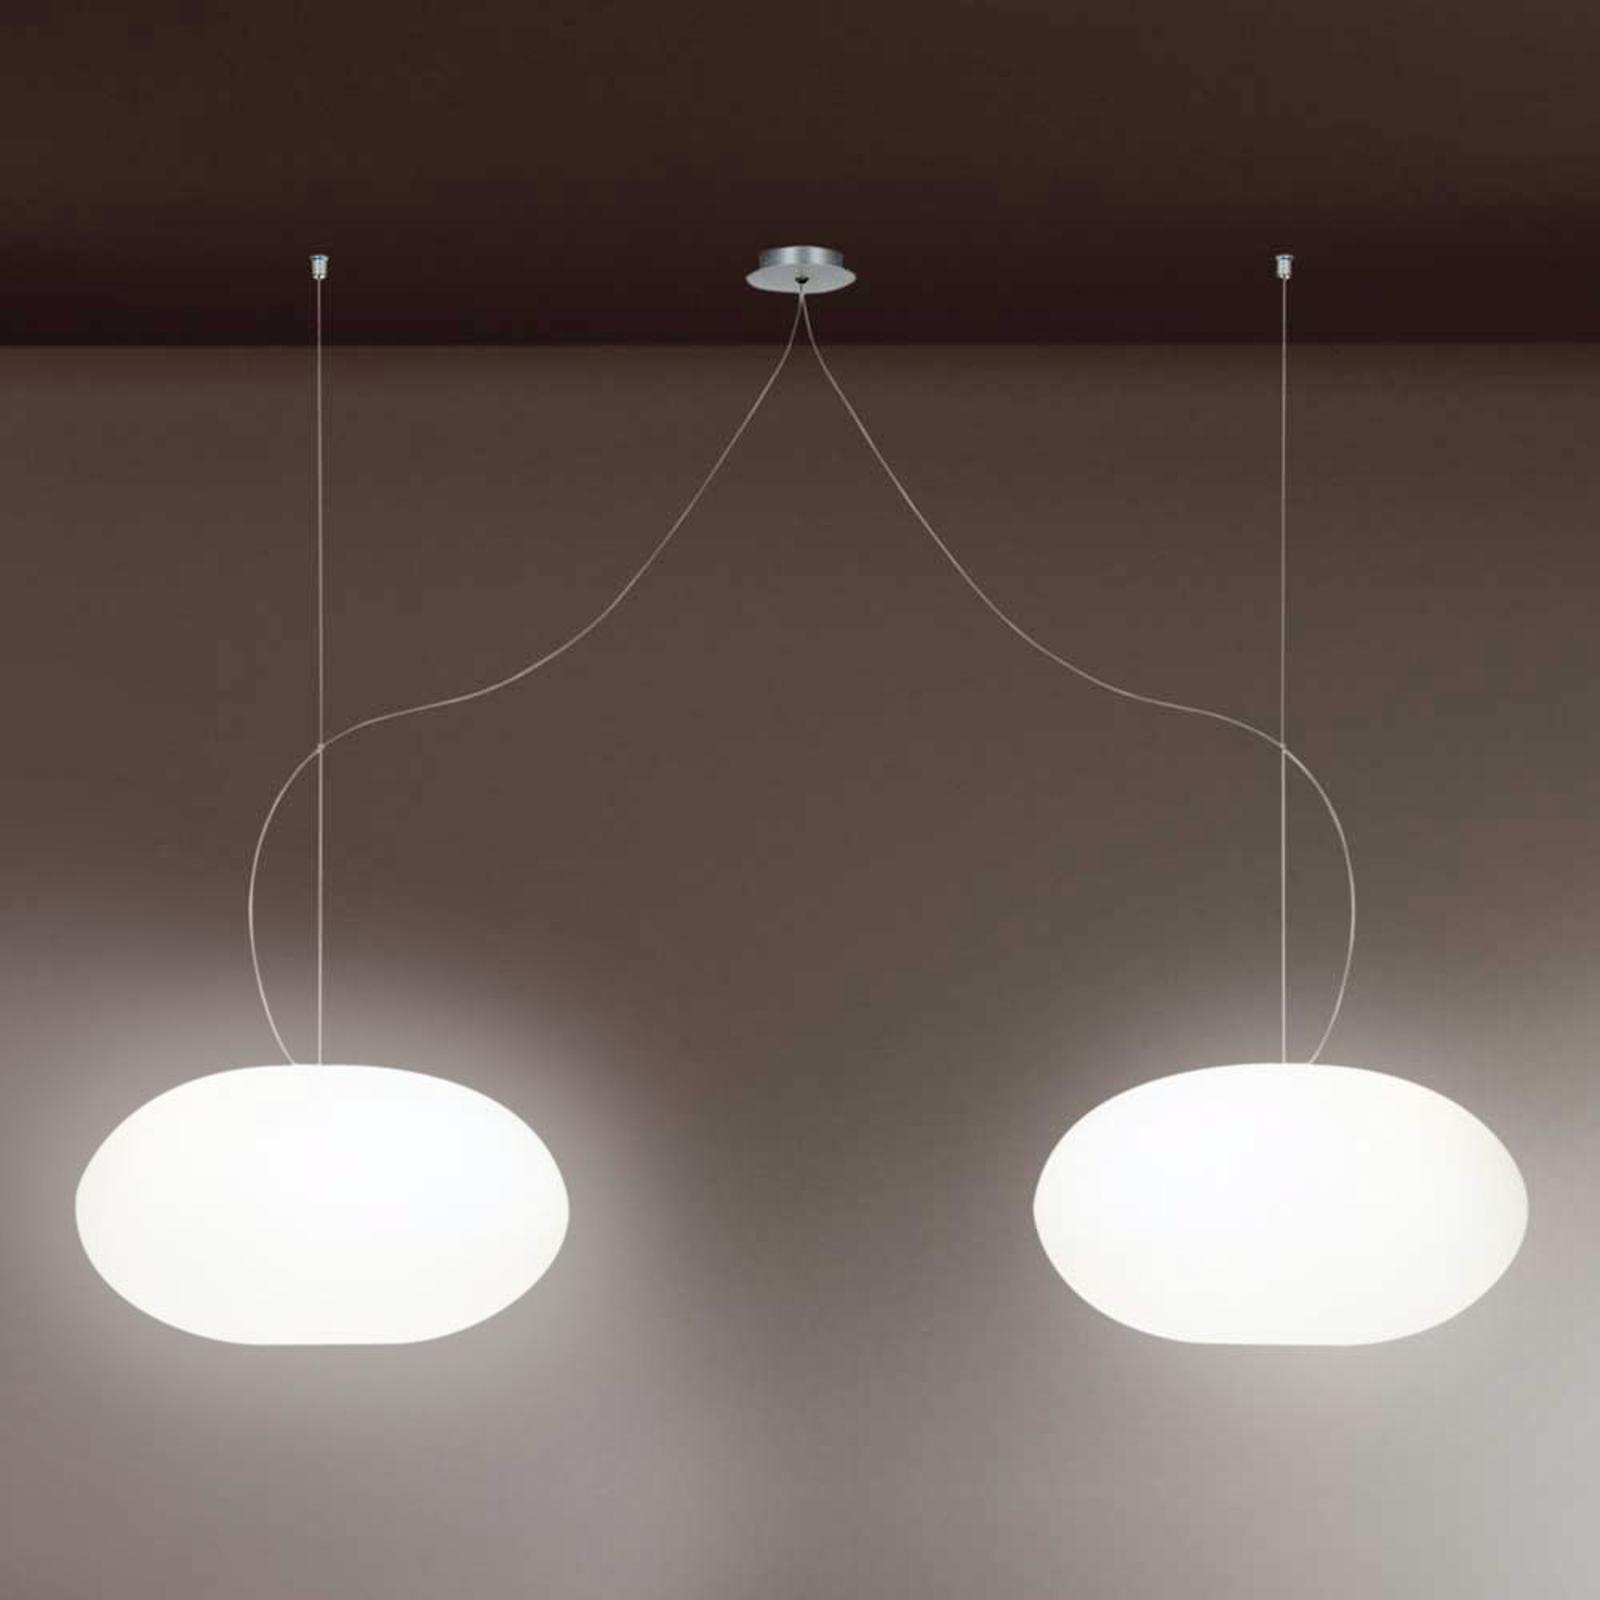 Designerska lampa wisząca AIH 28cm biała błysk